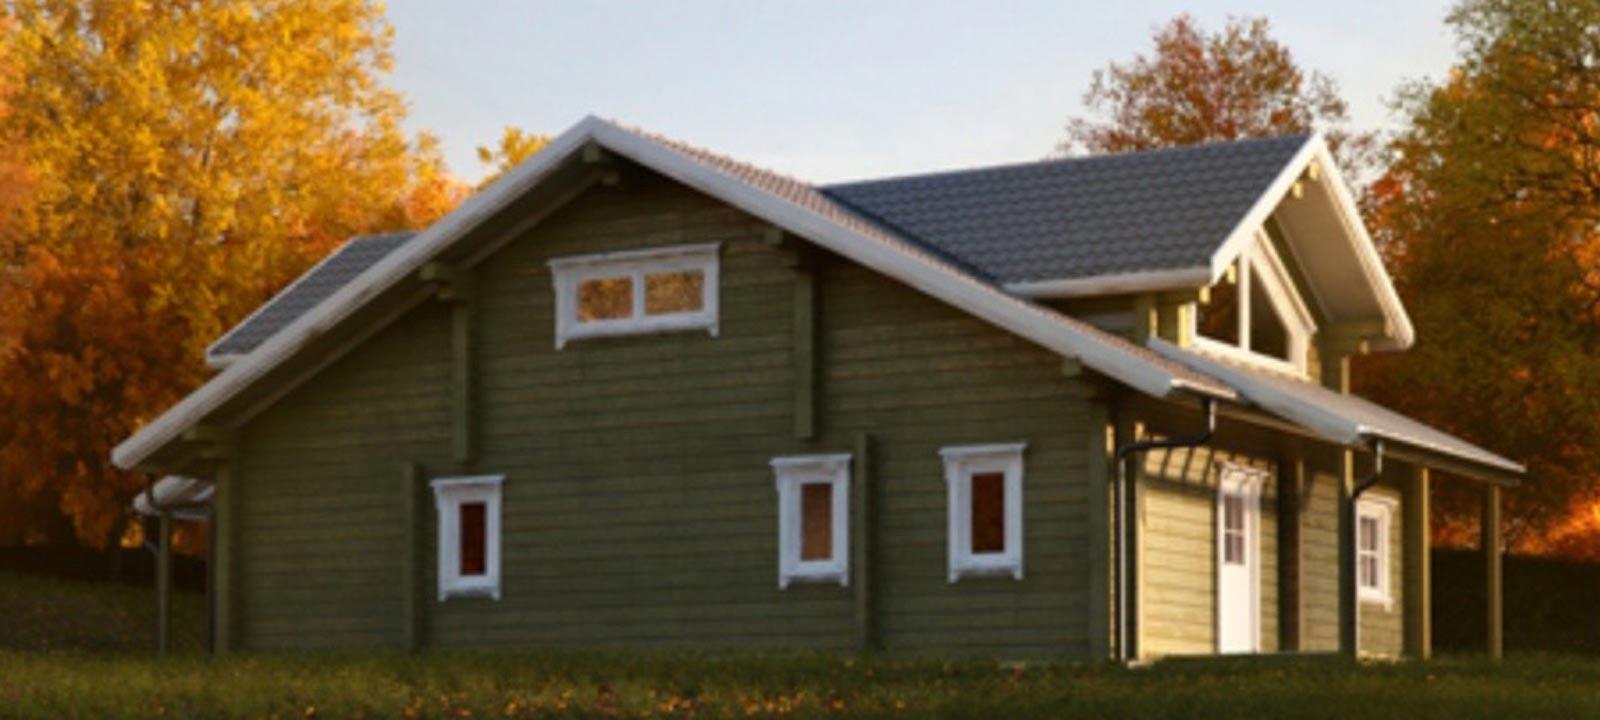 WoodVille Design Blokhut GREENFIELD VLR 144M2